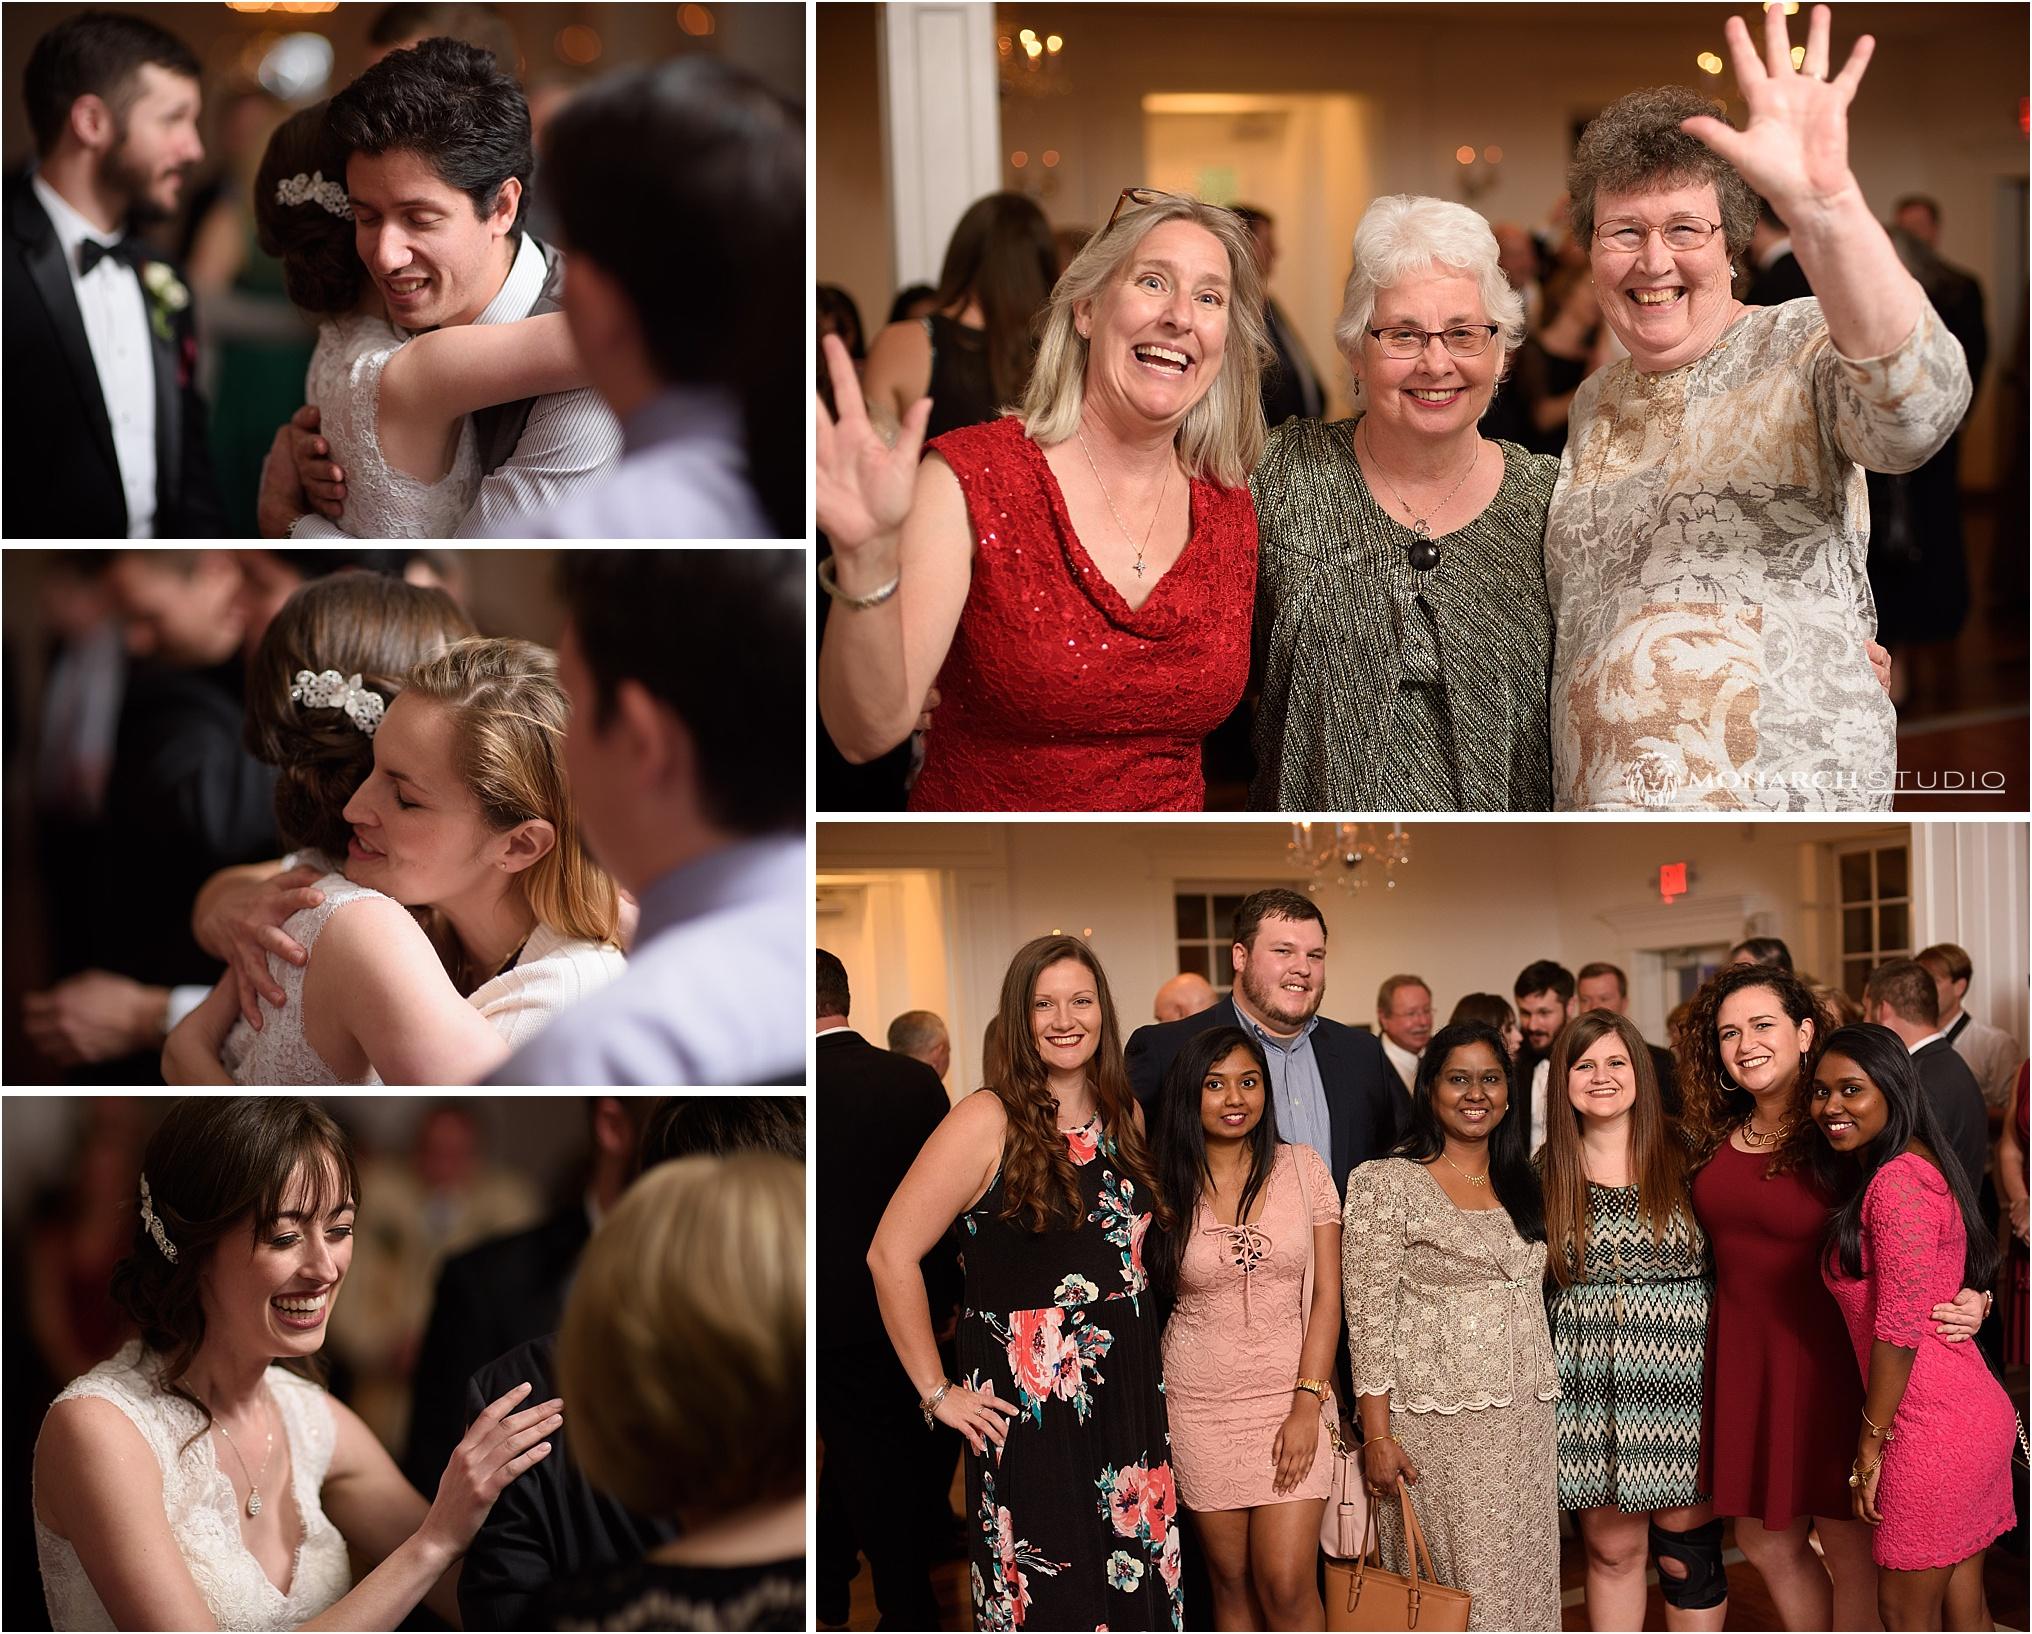 st-augustine-wedding-photographer-white-room-112.jpg